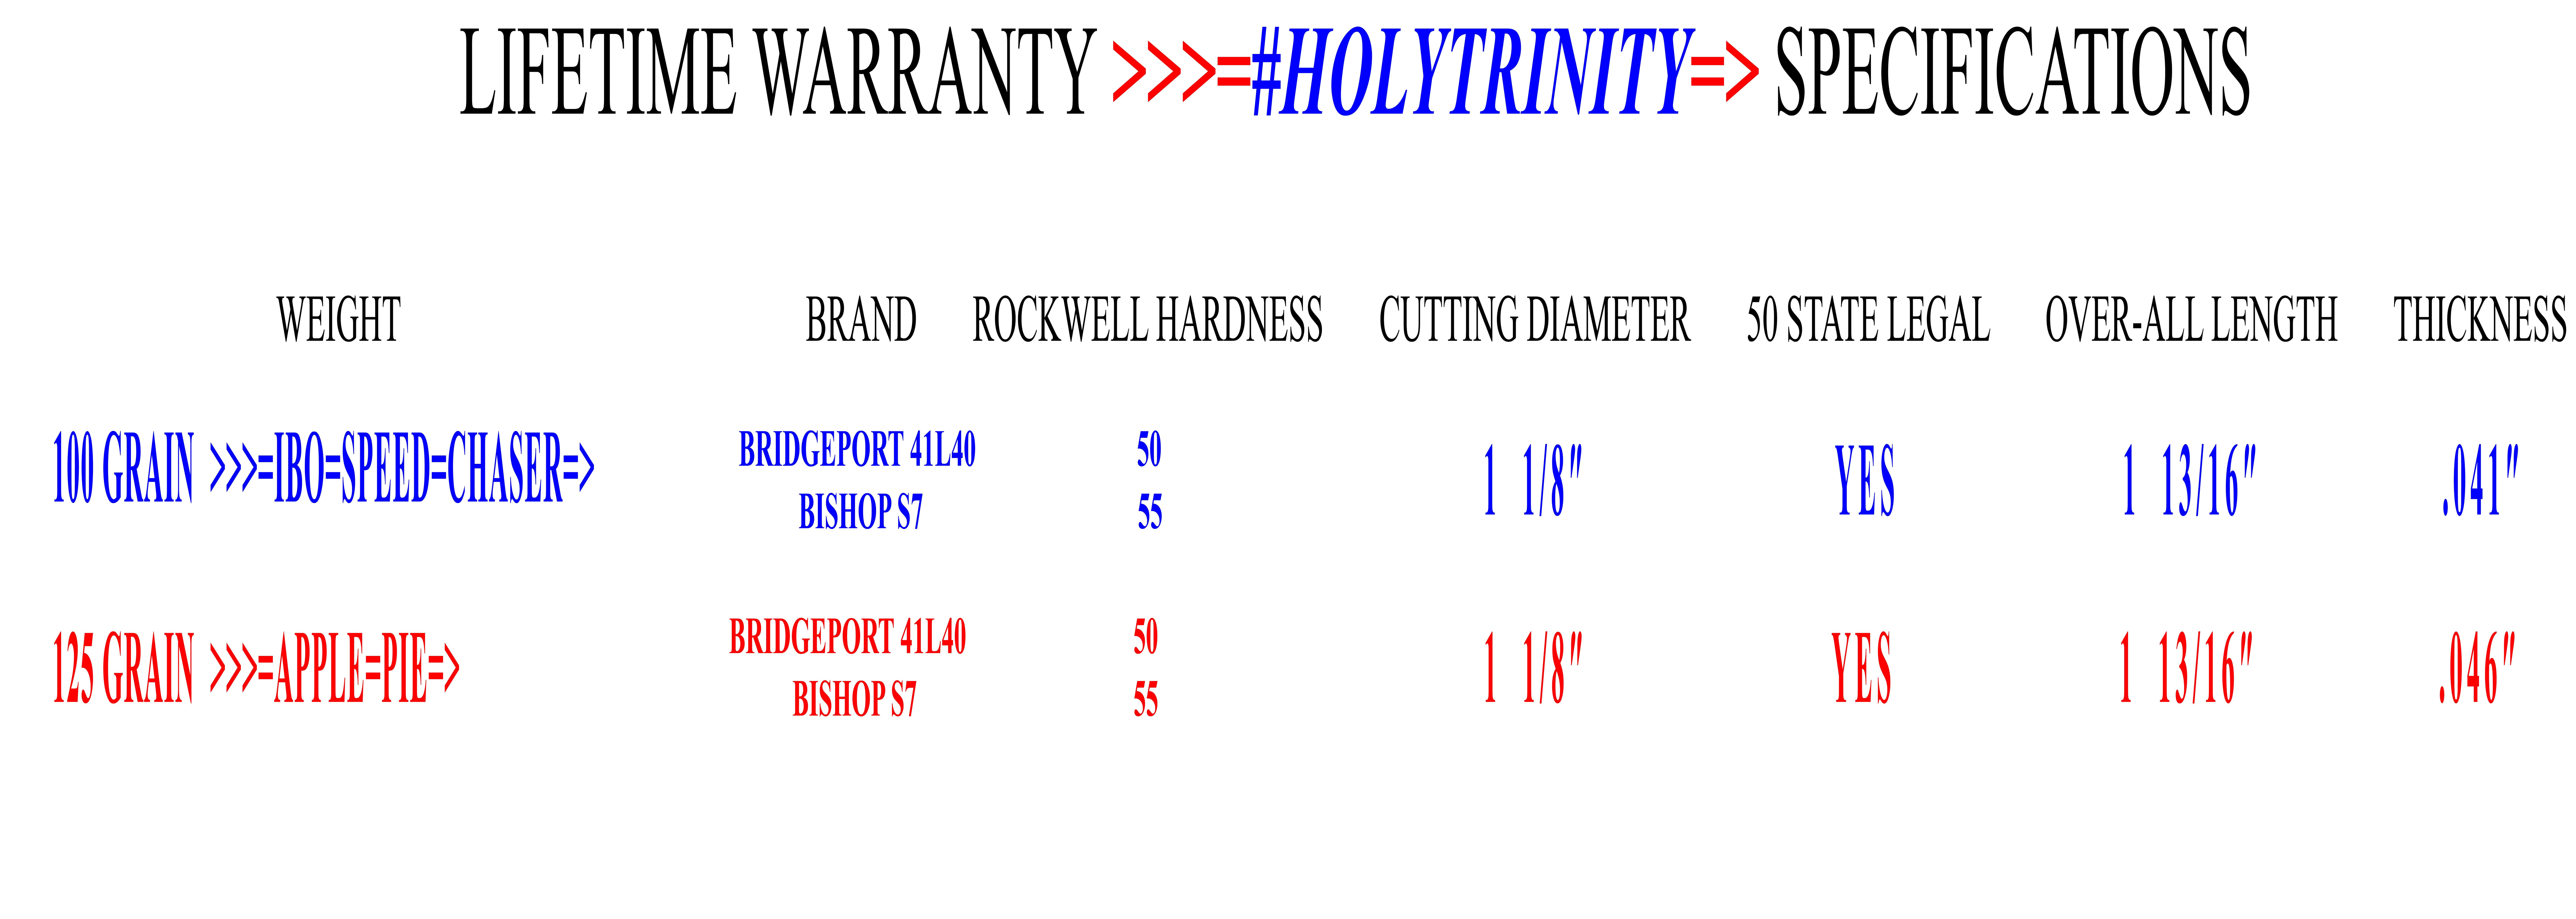 12252016-holytrinity-specs-large-english.jpg